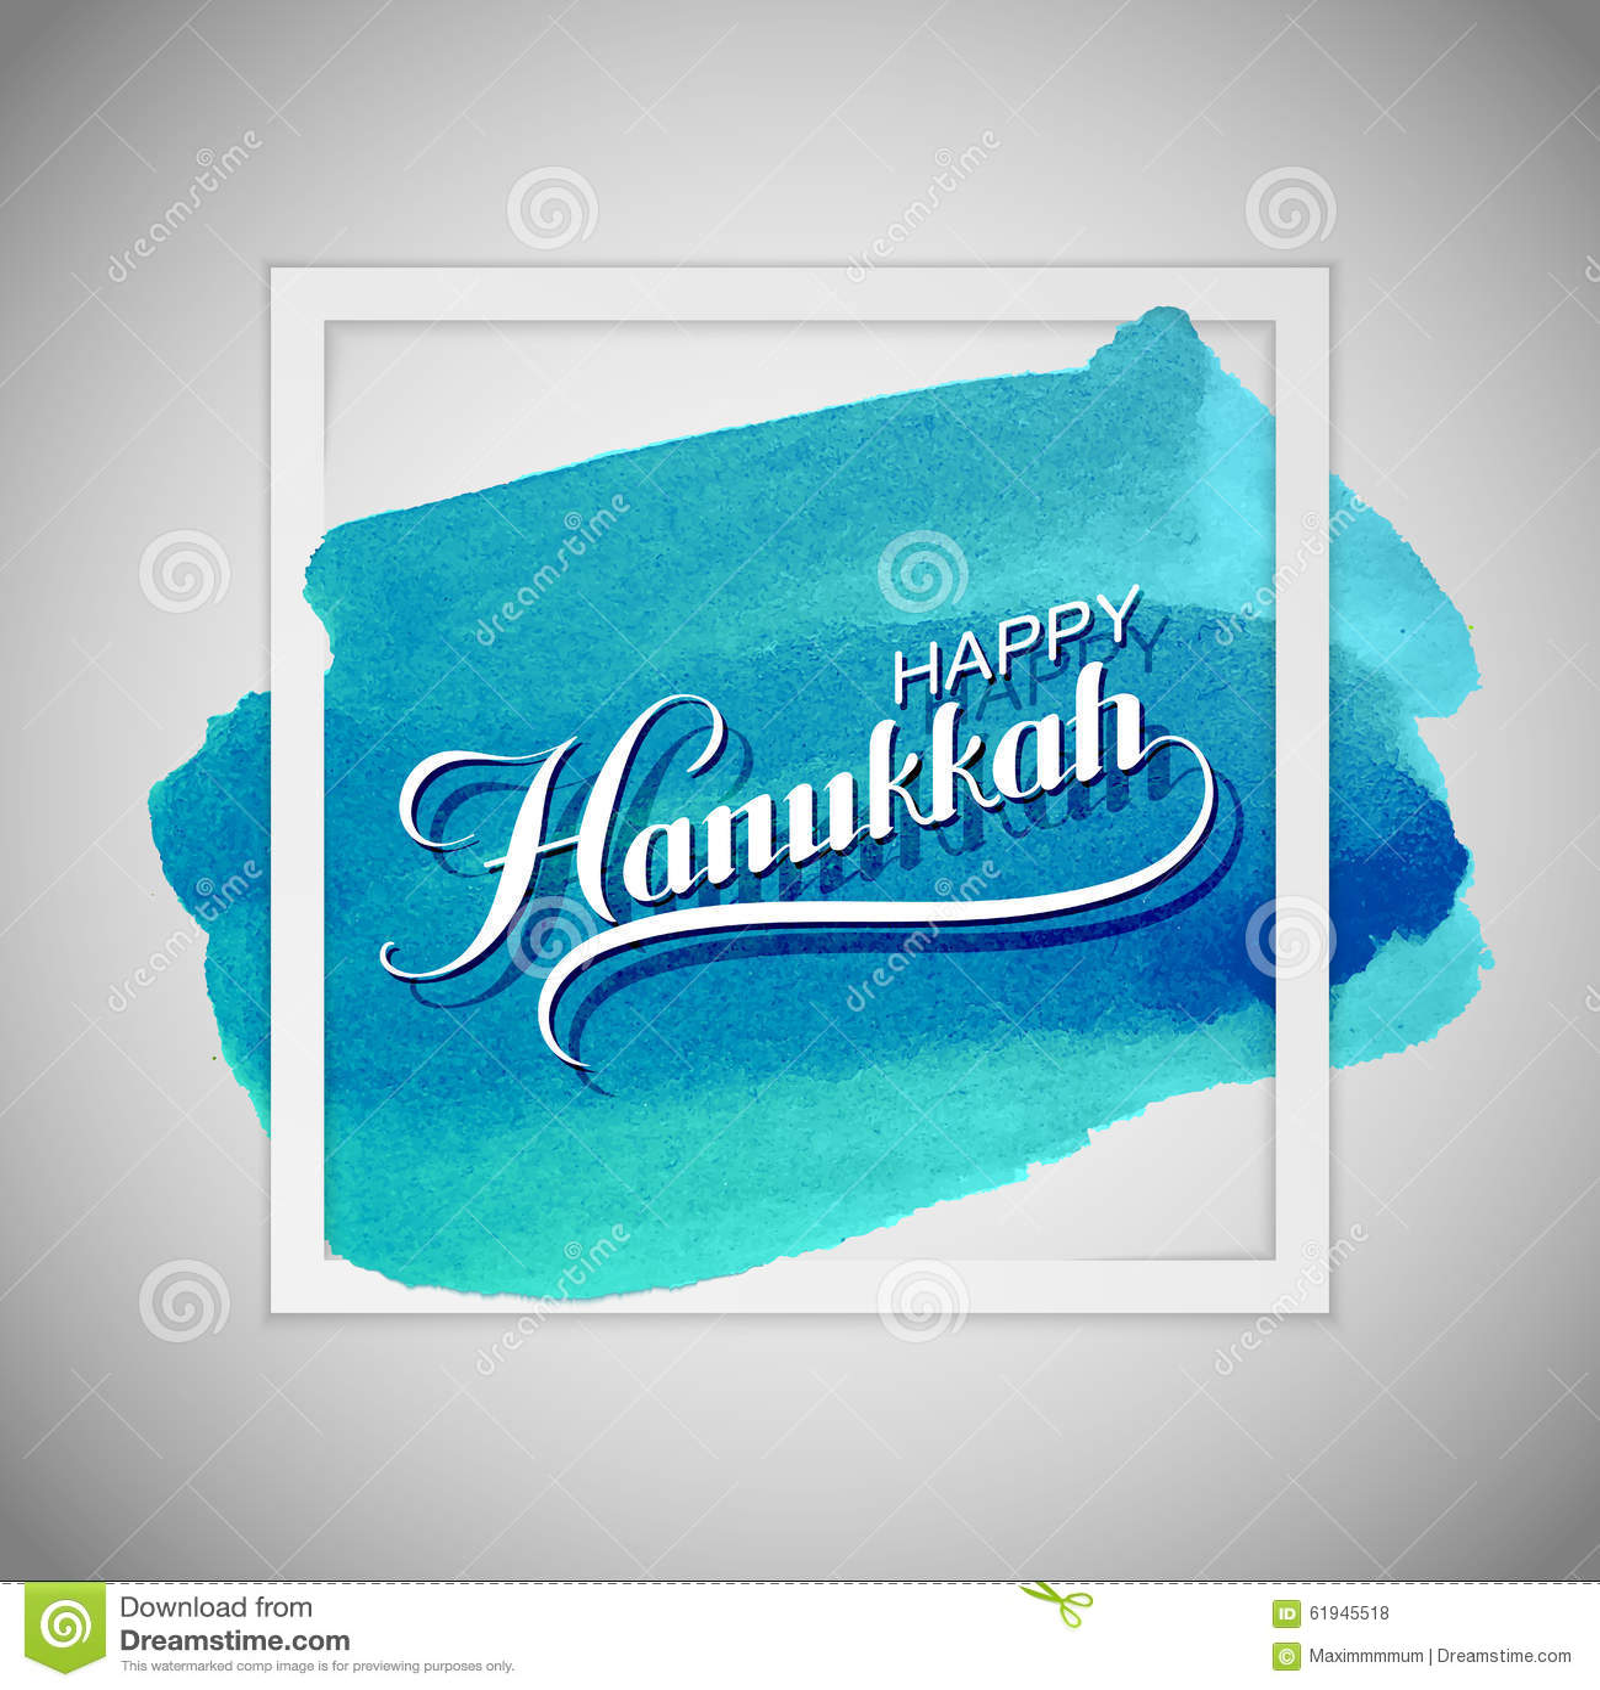 Szczęśliwego hanukkah